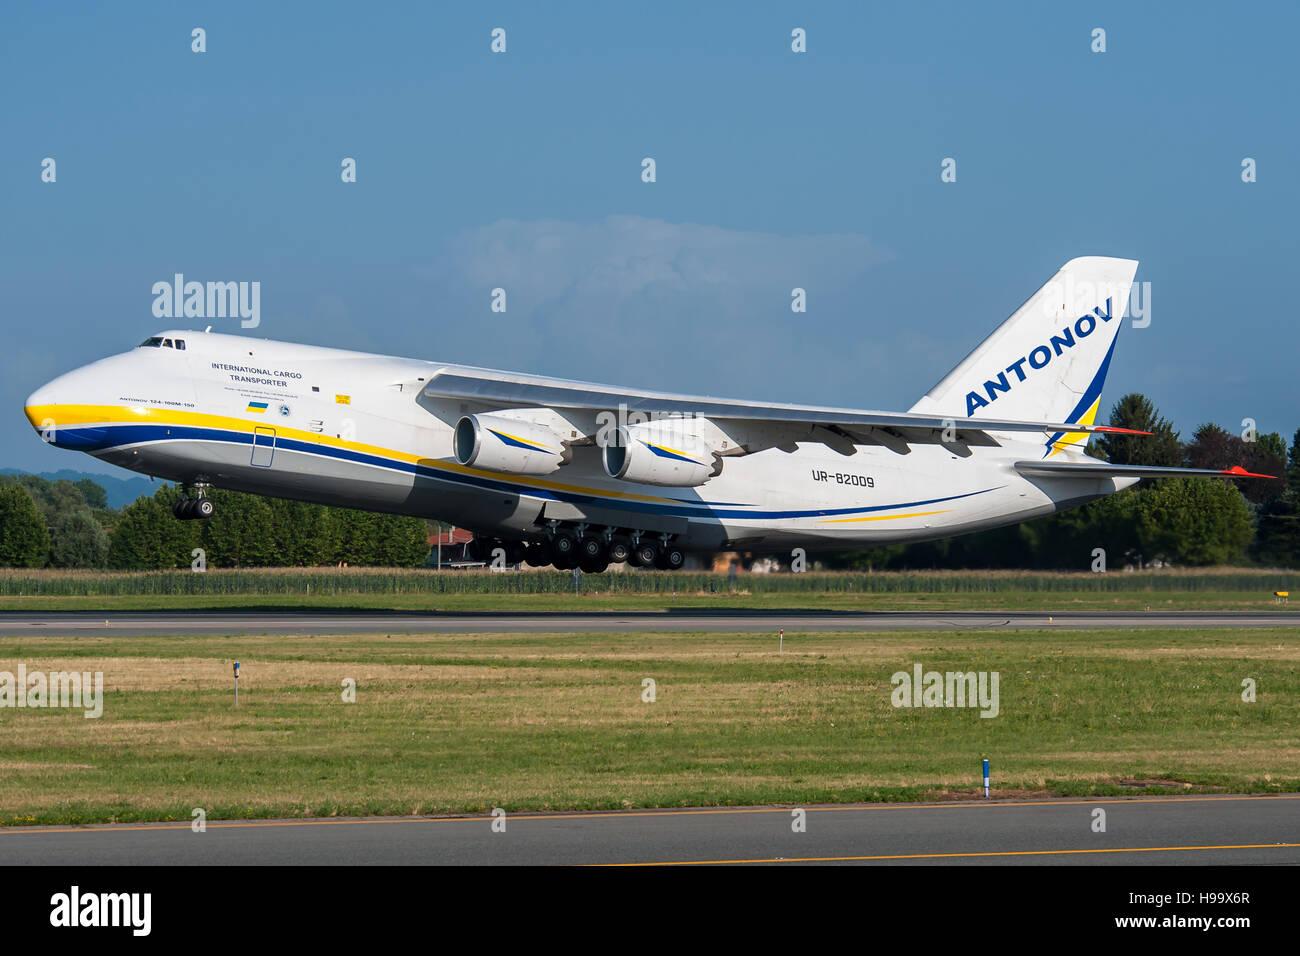 Antonov AN124 Design Bureau departing from Turin Airport - Stock Image